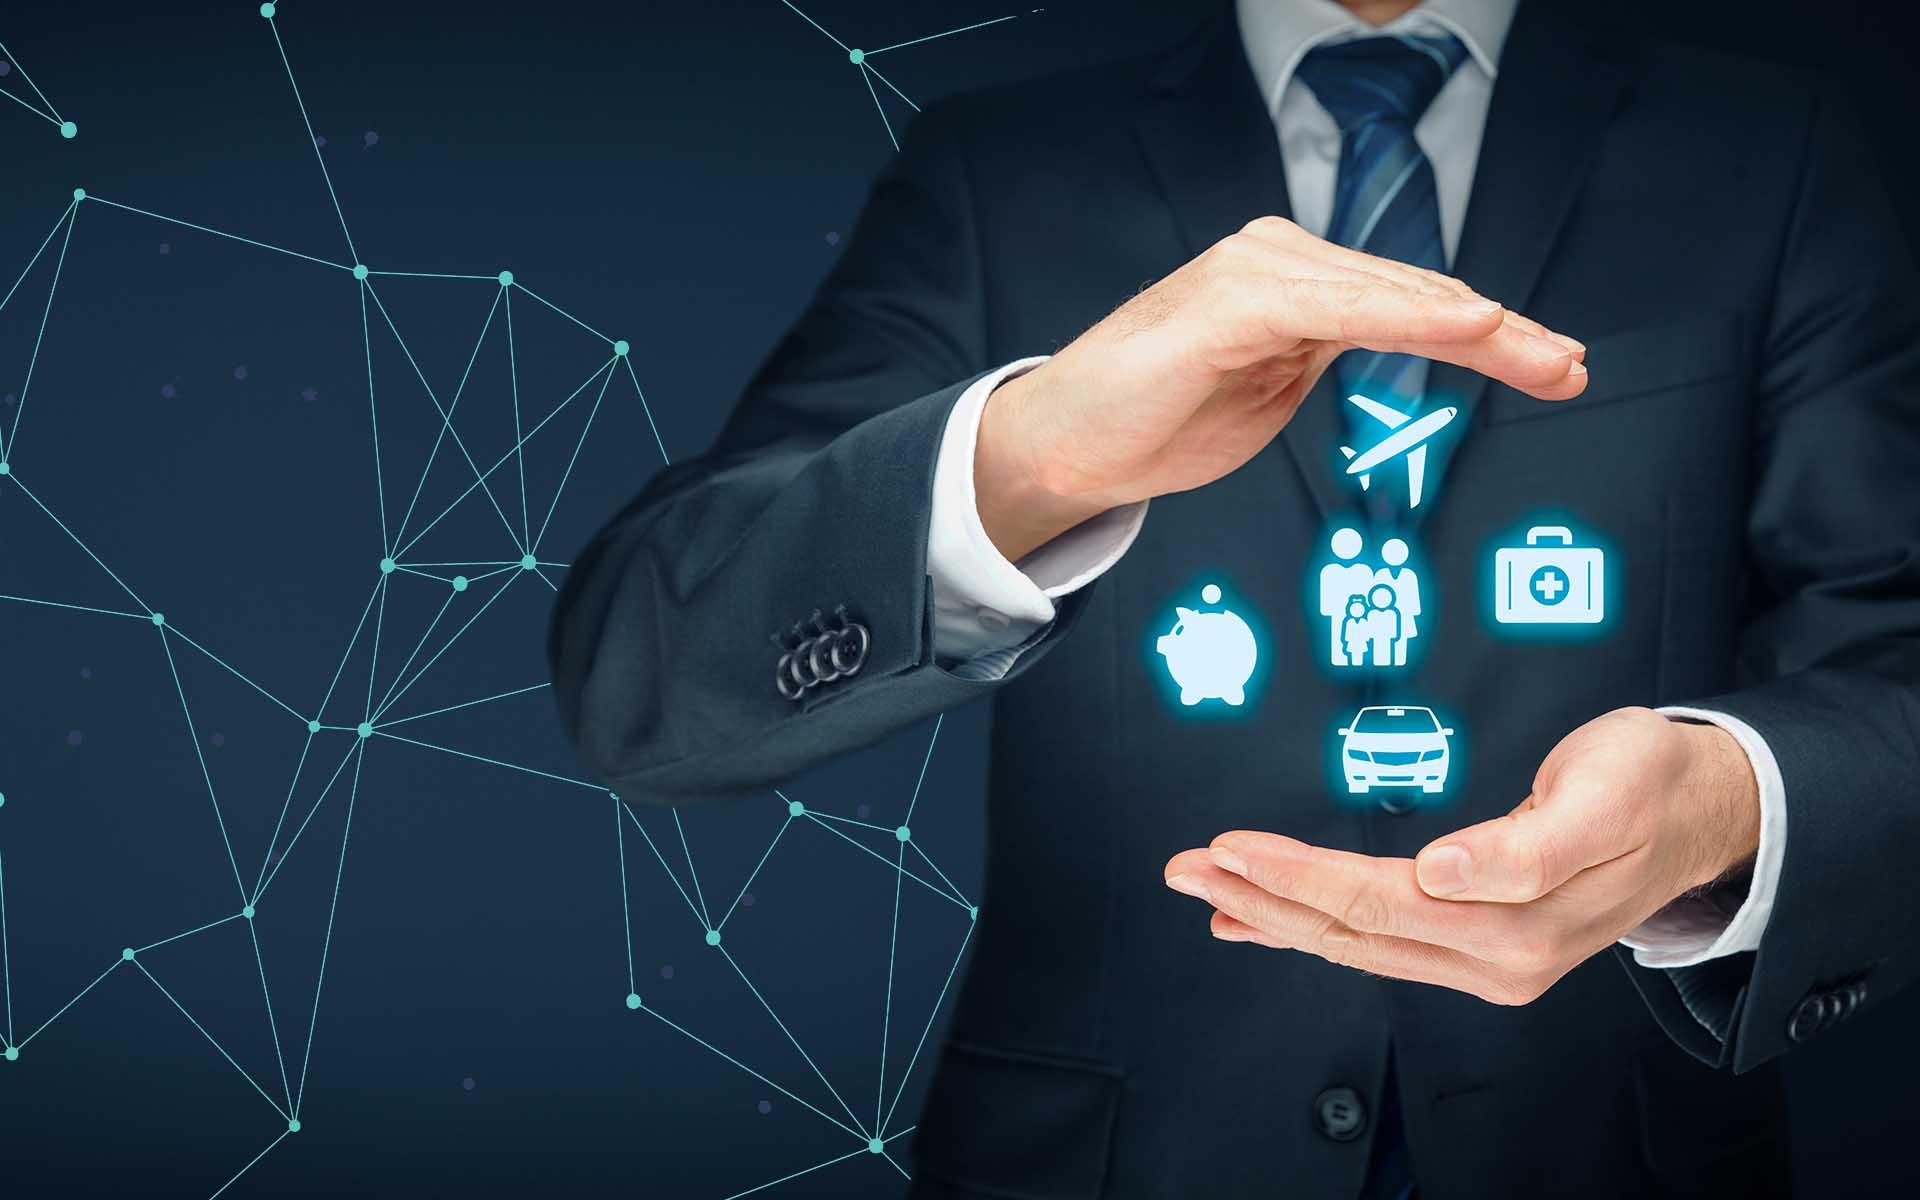 Major Chinese Insurance Firm to Apply Blockchain Technology via New Partnership